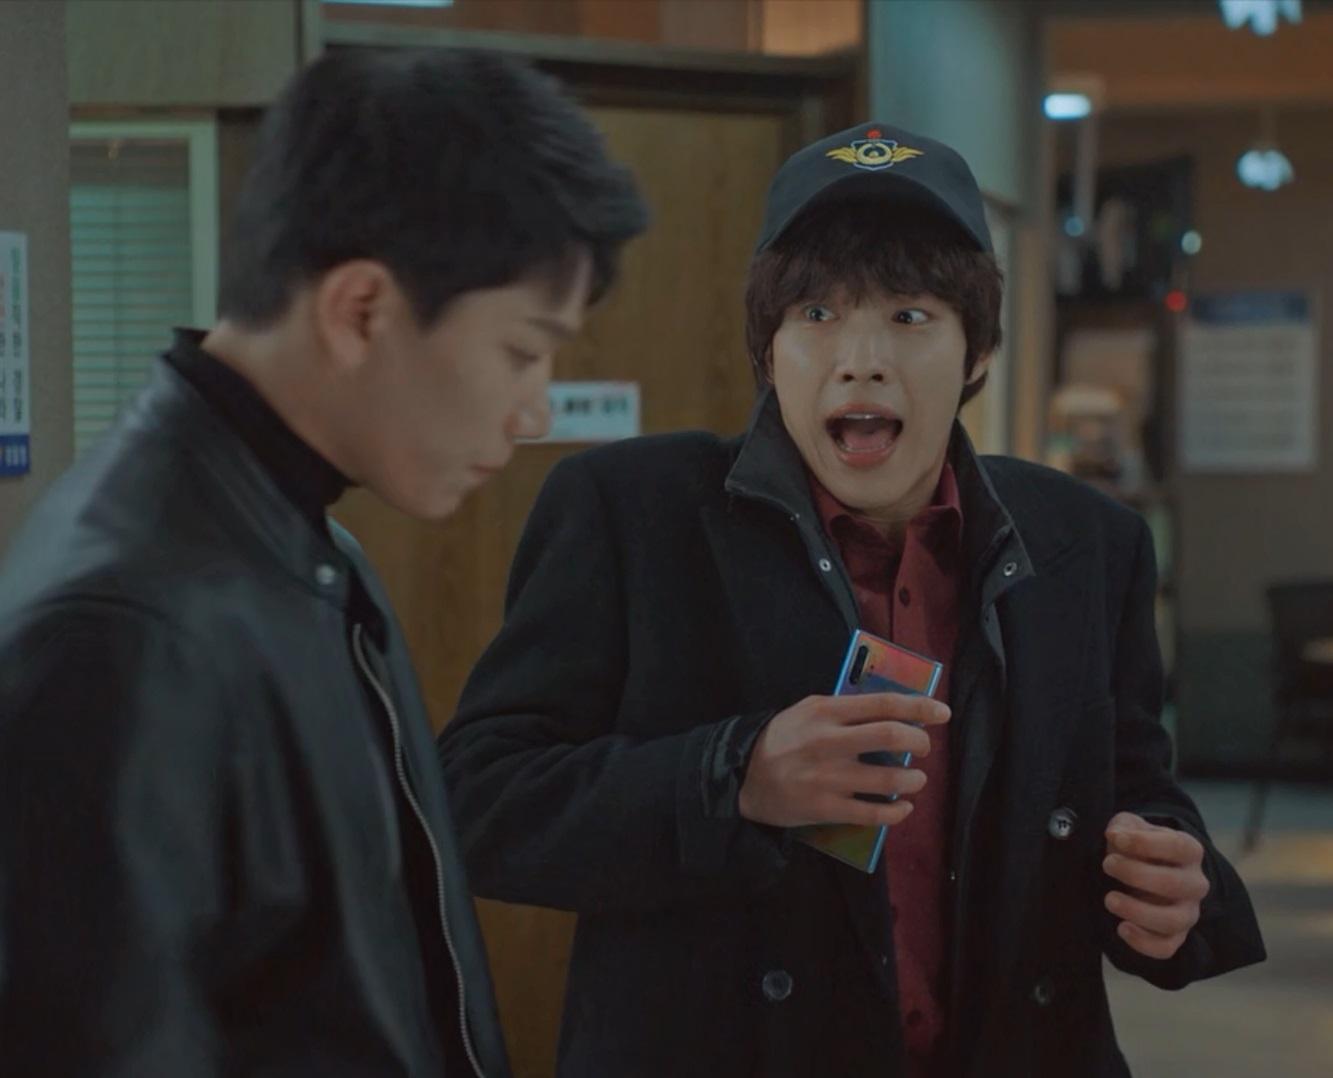 Woo Do Hwan in The King: Eternal Monarch Korean Drama (2020) نقد و بررسی سریال کره ای پادشاه: سلطنت ابدی (The King: Eternal Monarch)